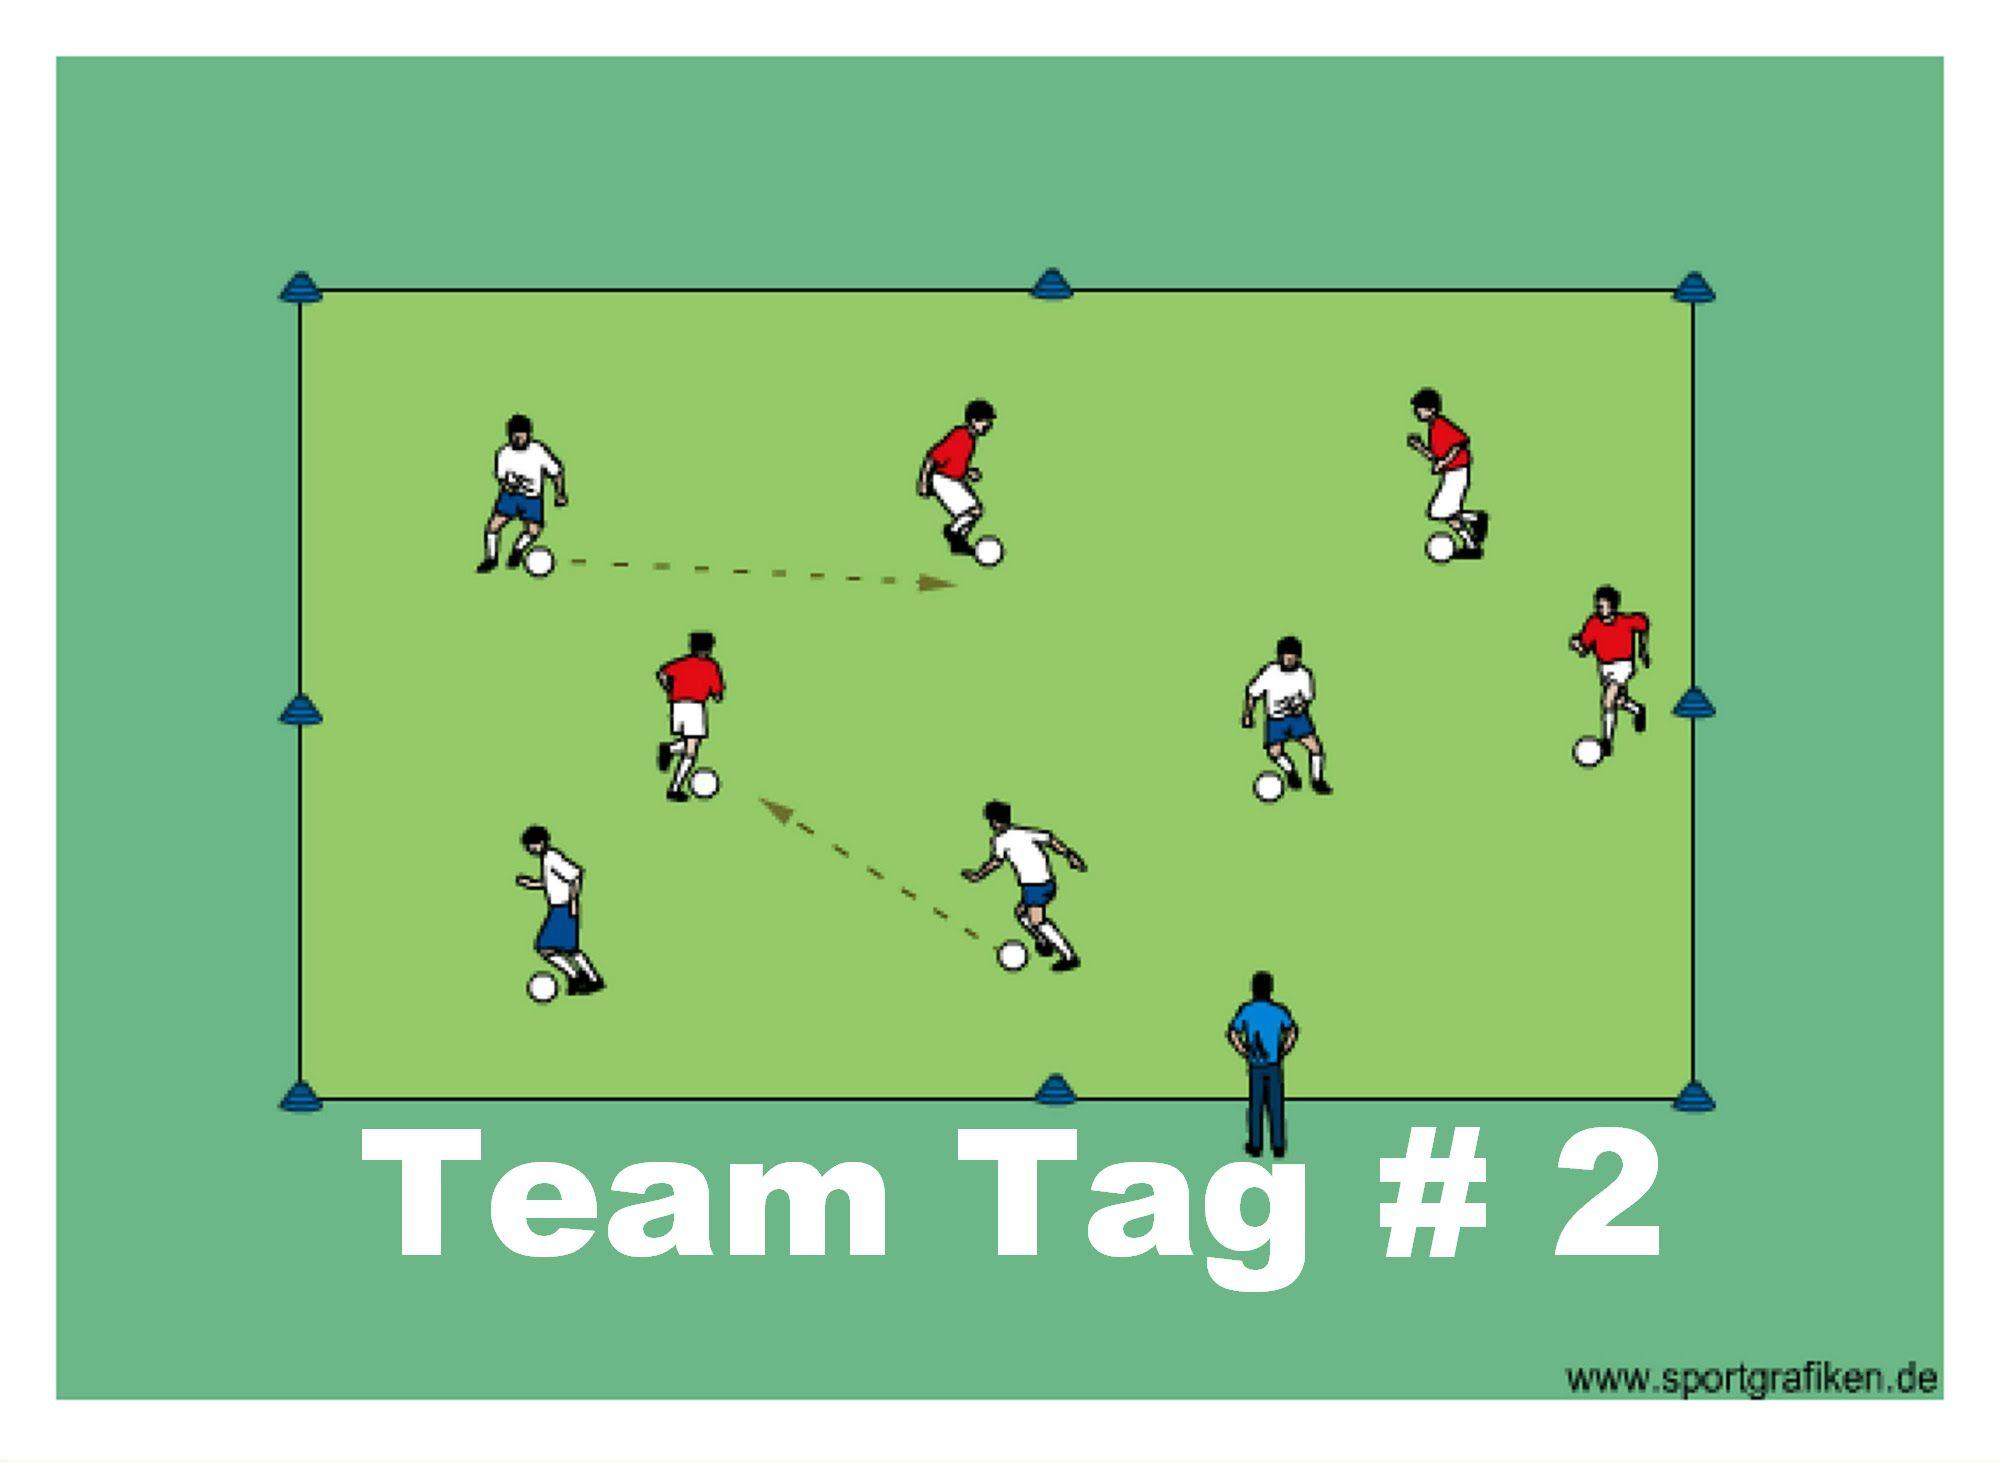 Http Www Top Soccer Drills Com Team Tag 2 Html Funsoccerpassingdrills Fun Soccer Passing Drills Soccer Training Fun Soccer Drills Soccer Passing Drills